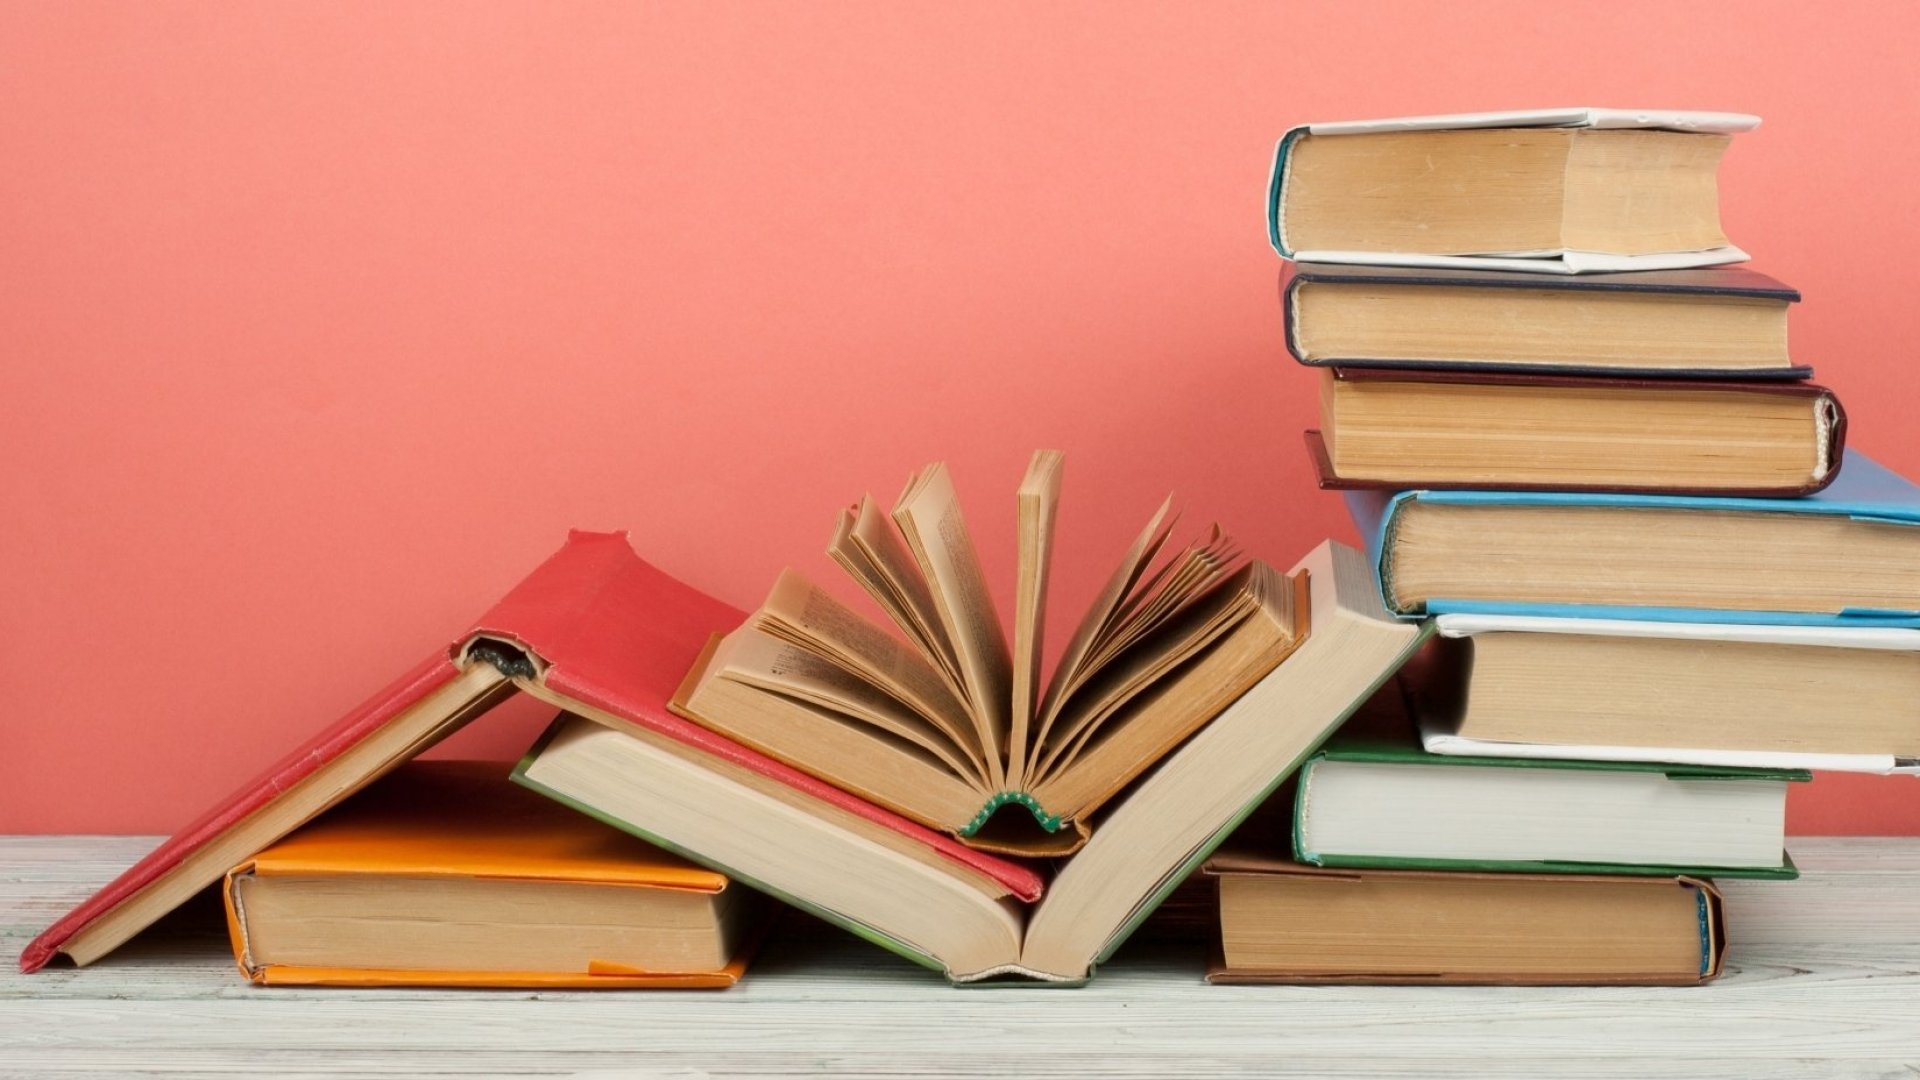 5 Books to Guide You Through Entrepreneurship in the New Decade